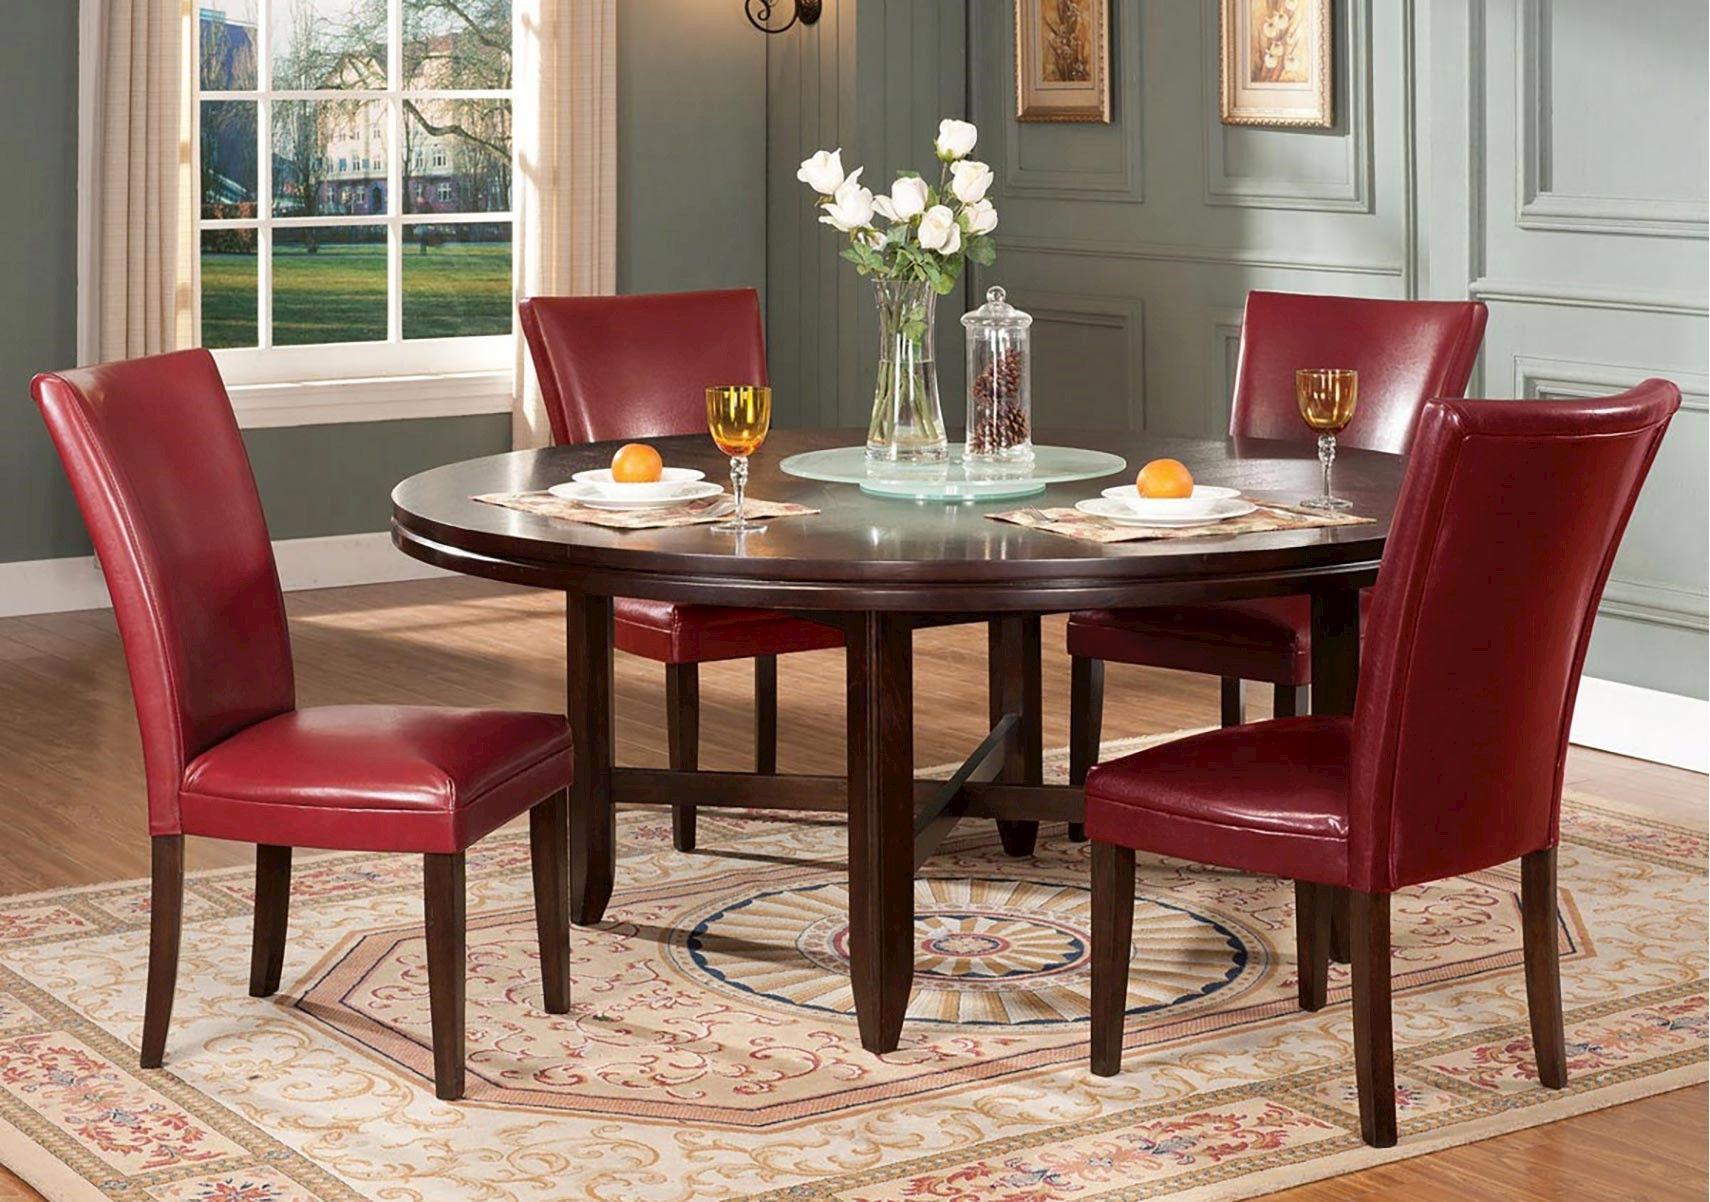 Lacks Hartford 6 Pc Red Dining Set 72 Inch Round Dining Table Contemporary Dining Table Dining Table